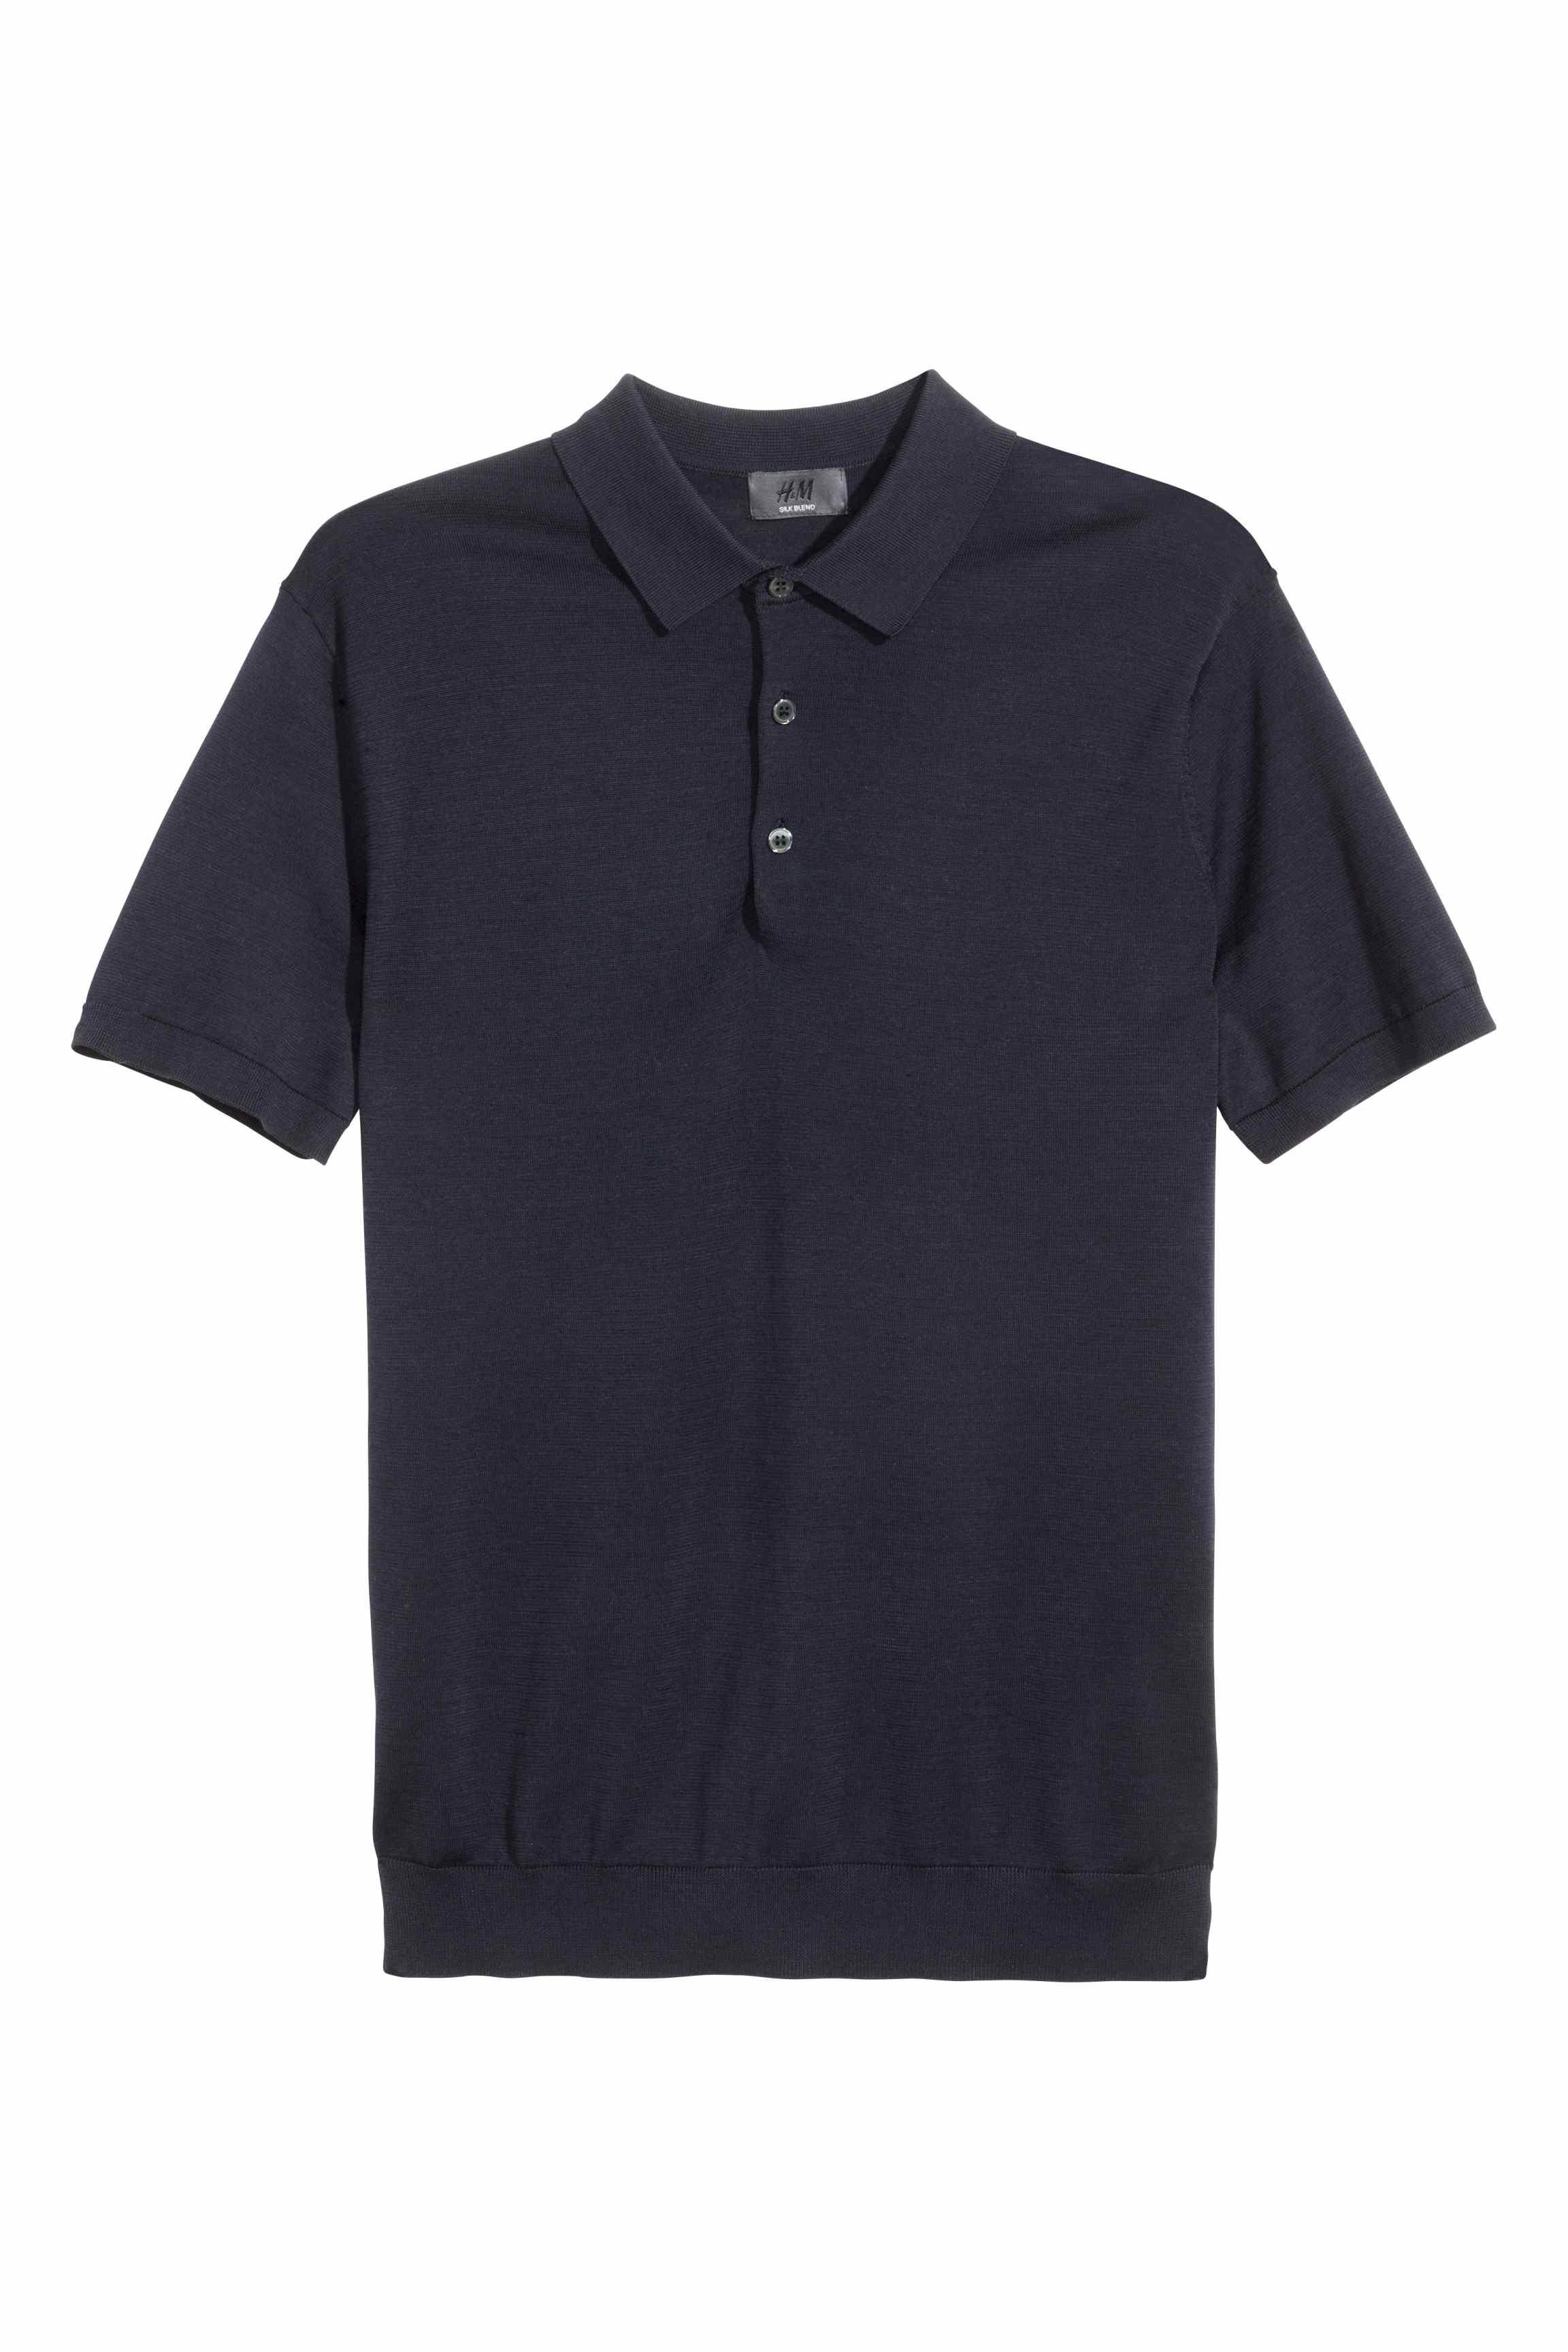 H m silk blend polo shirt in black for men lyst for H m polo shirt mens